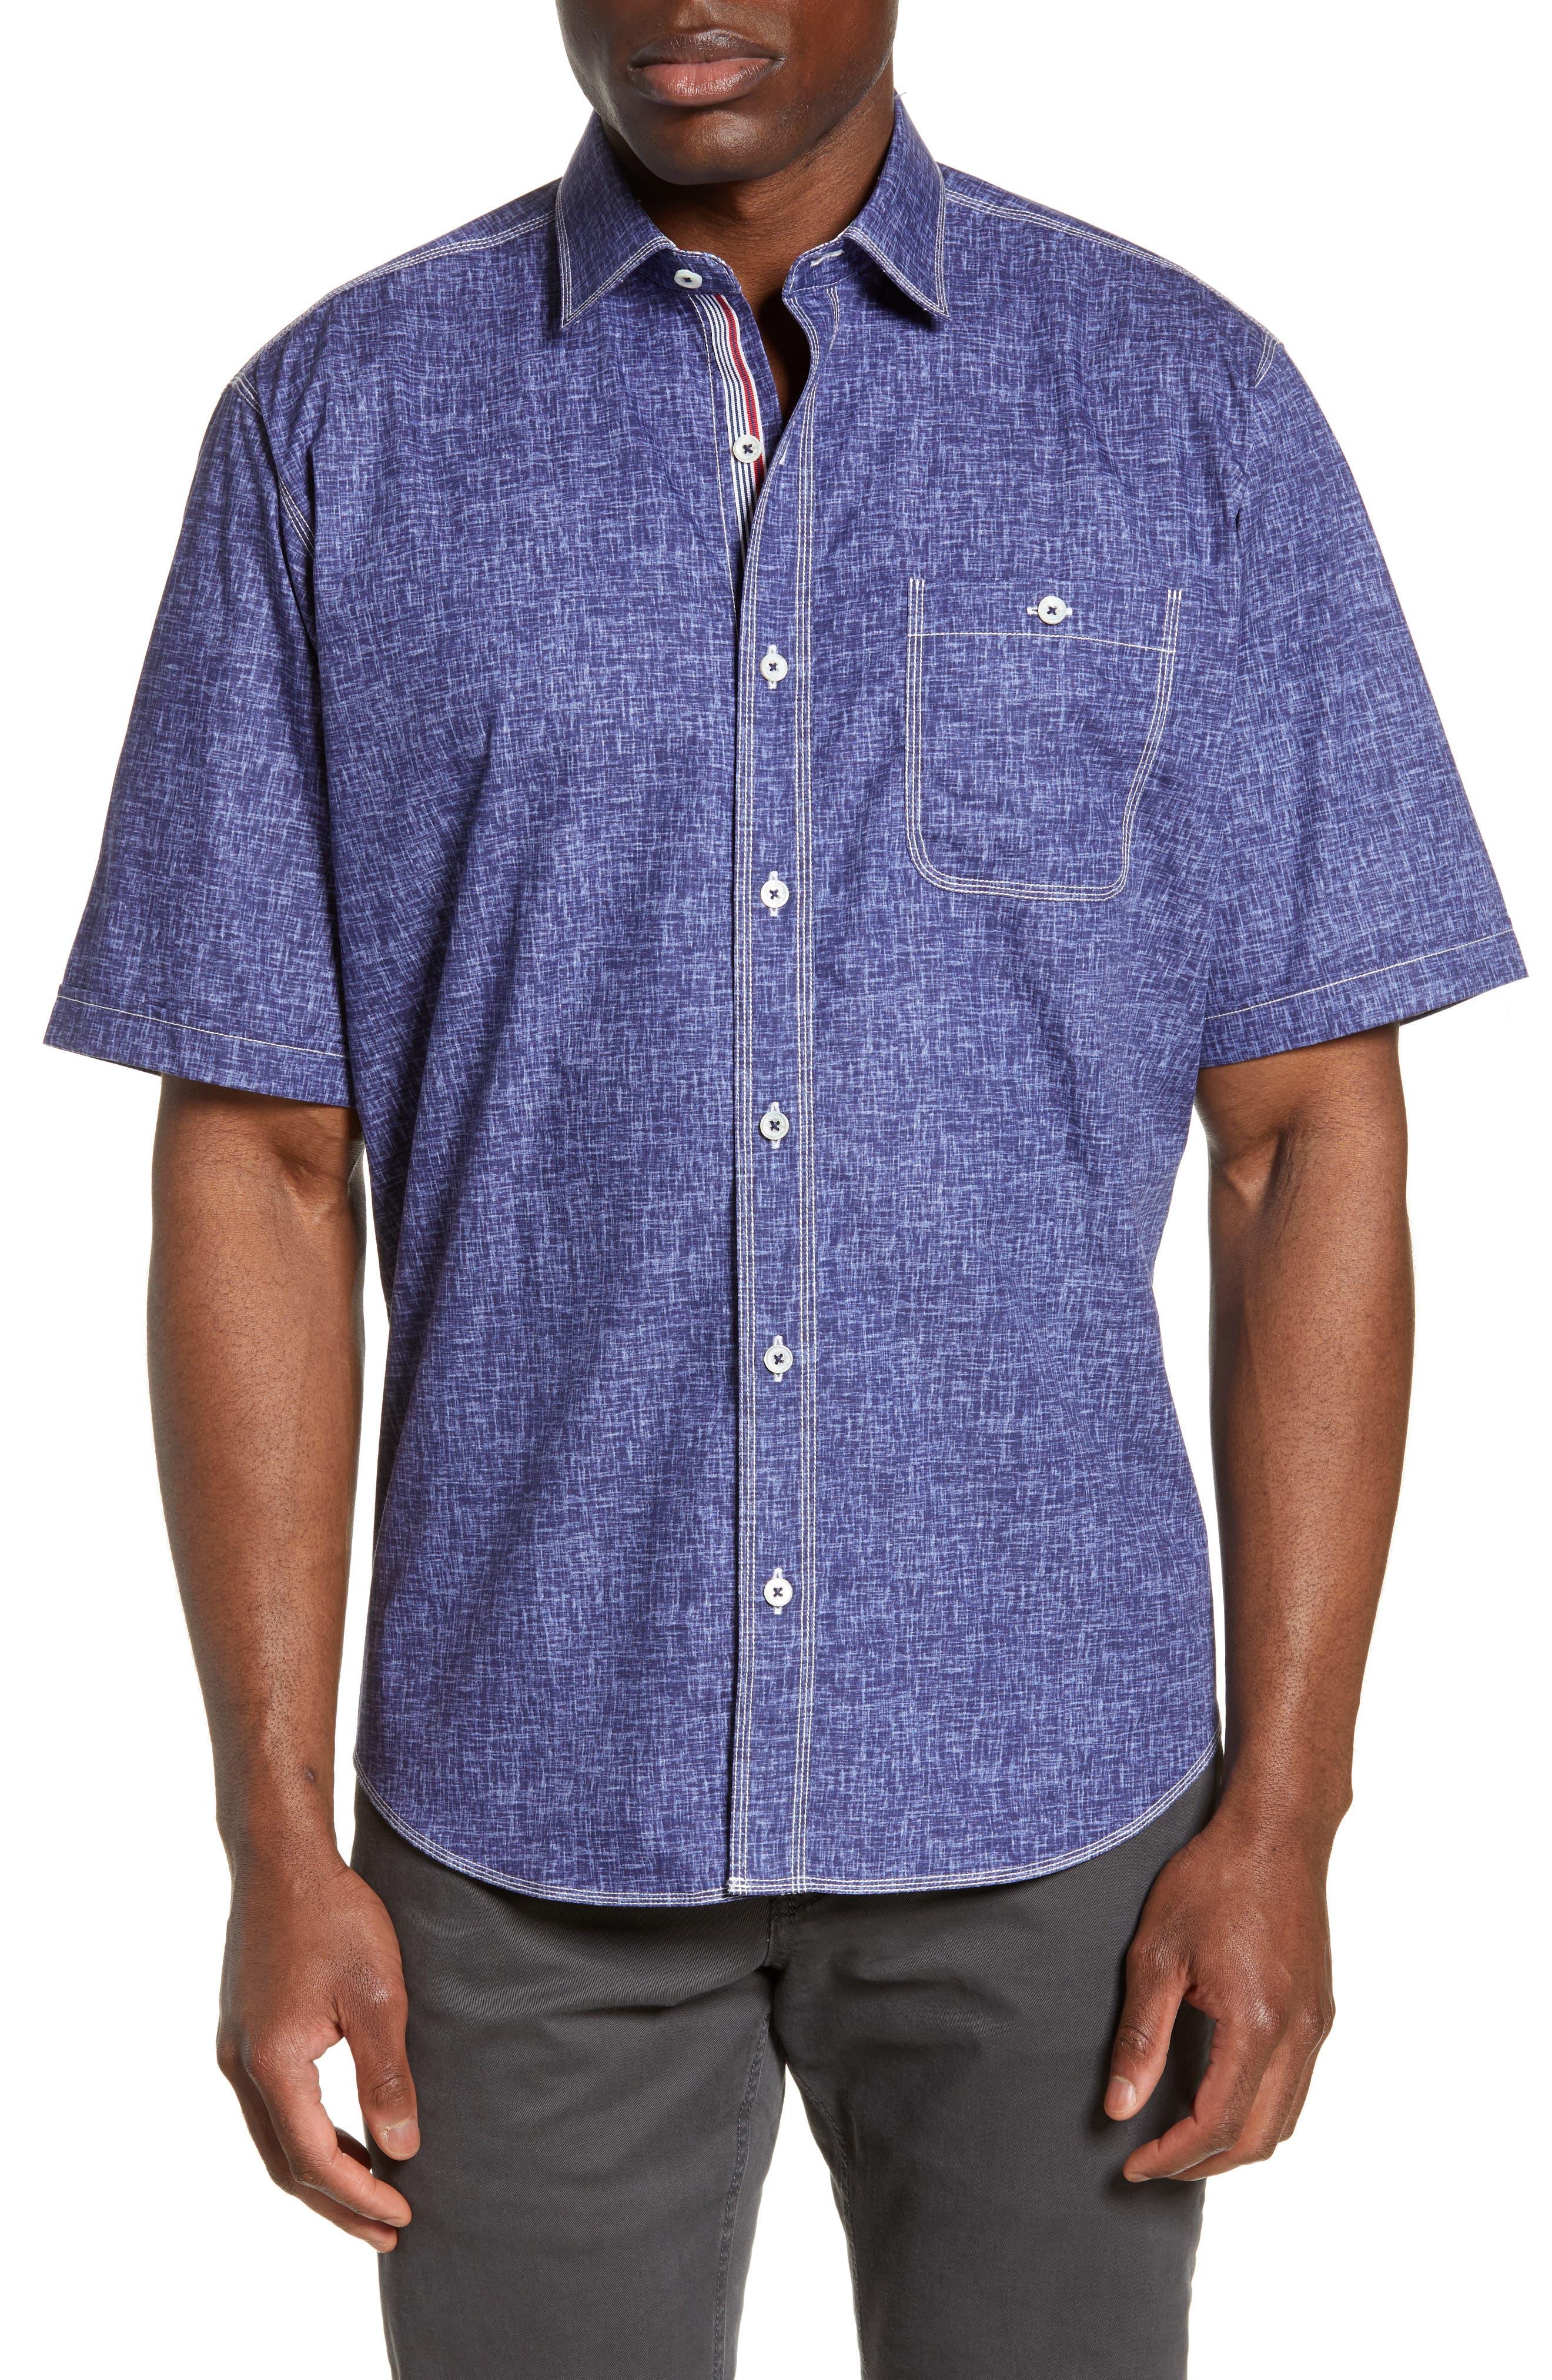 men's bugatchi classic fit chambray shirt